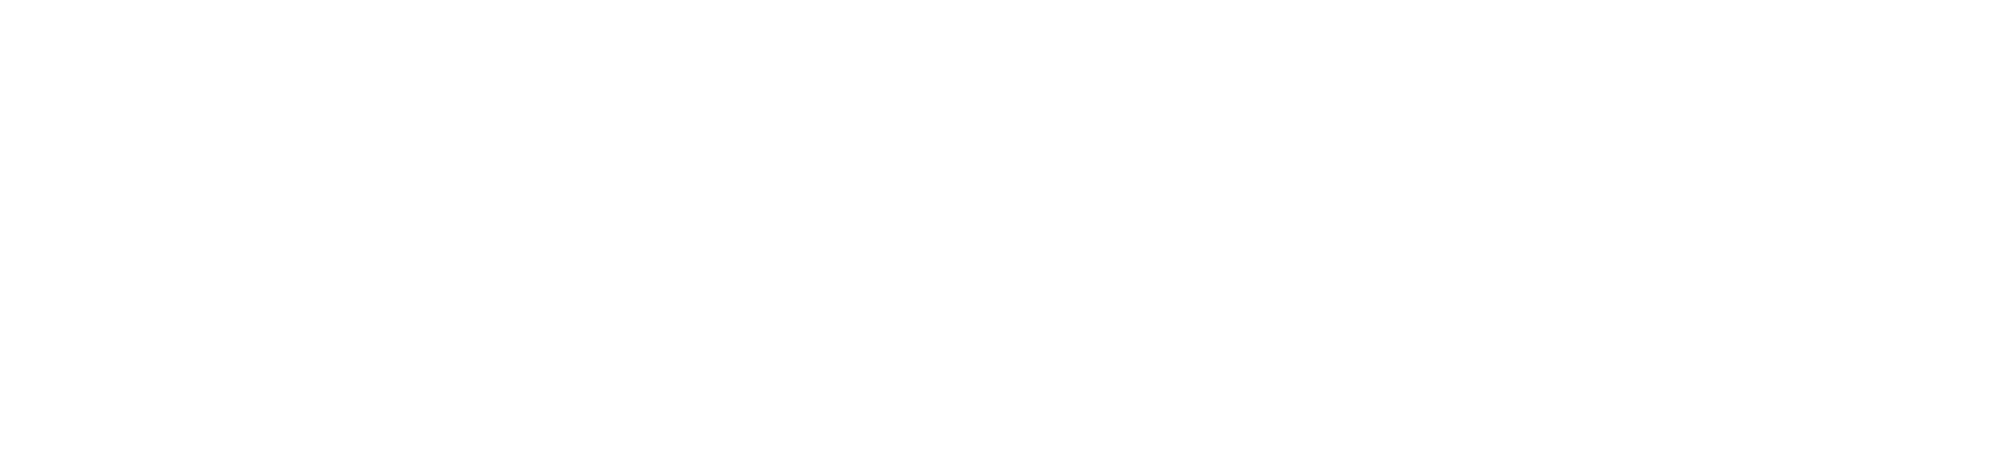 gearfire ecommerce 2.0 logo